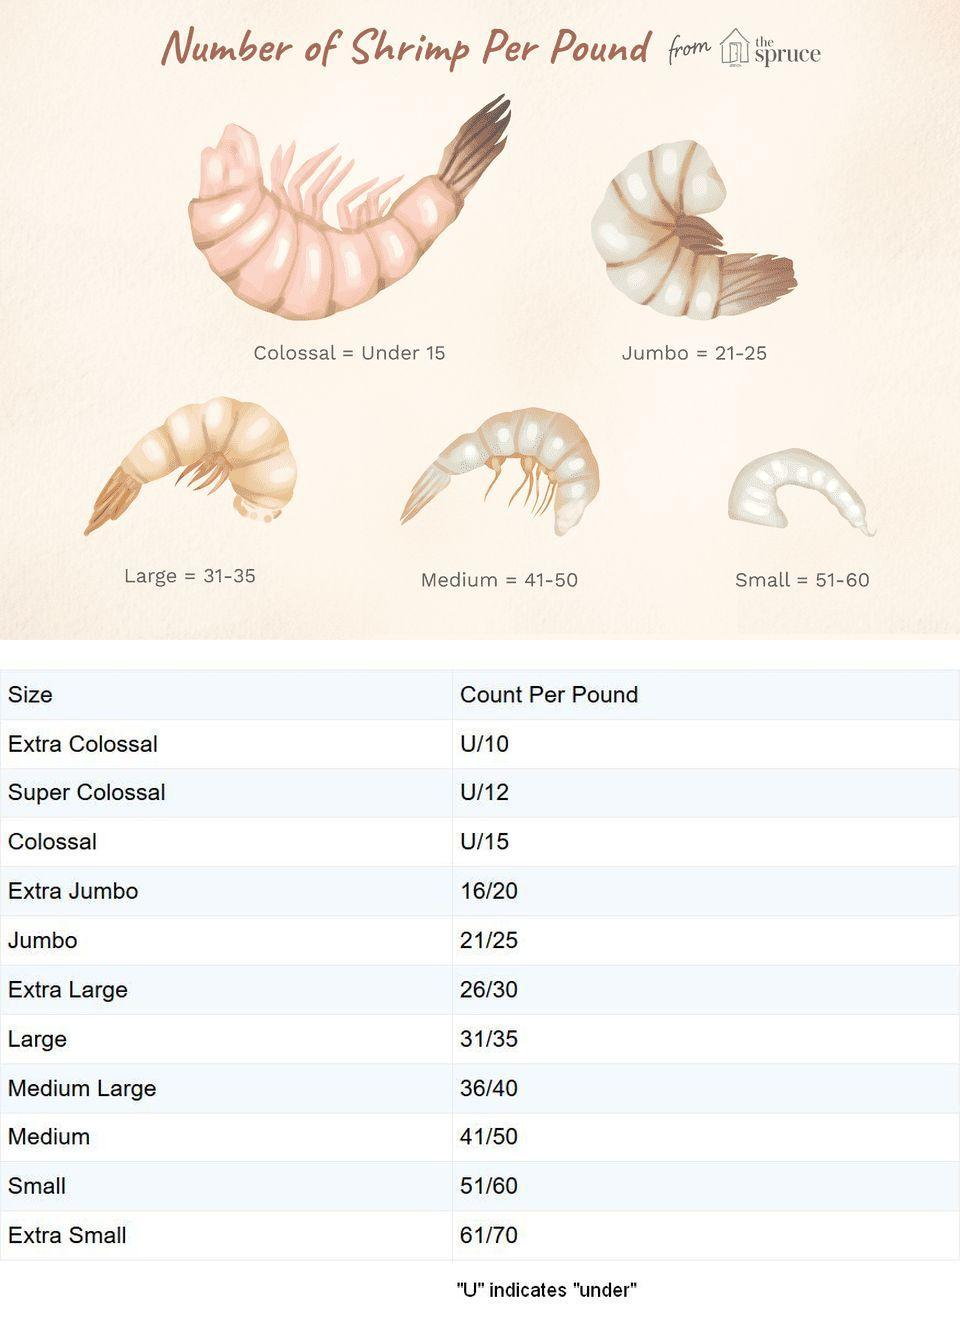 Shrimp Counts Per Pound and How Much to Serve | The spruce eats, Shrimp,  Large shrimp